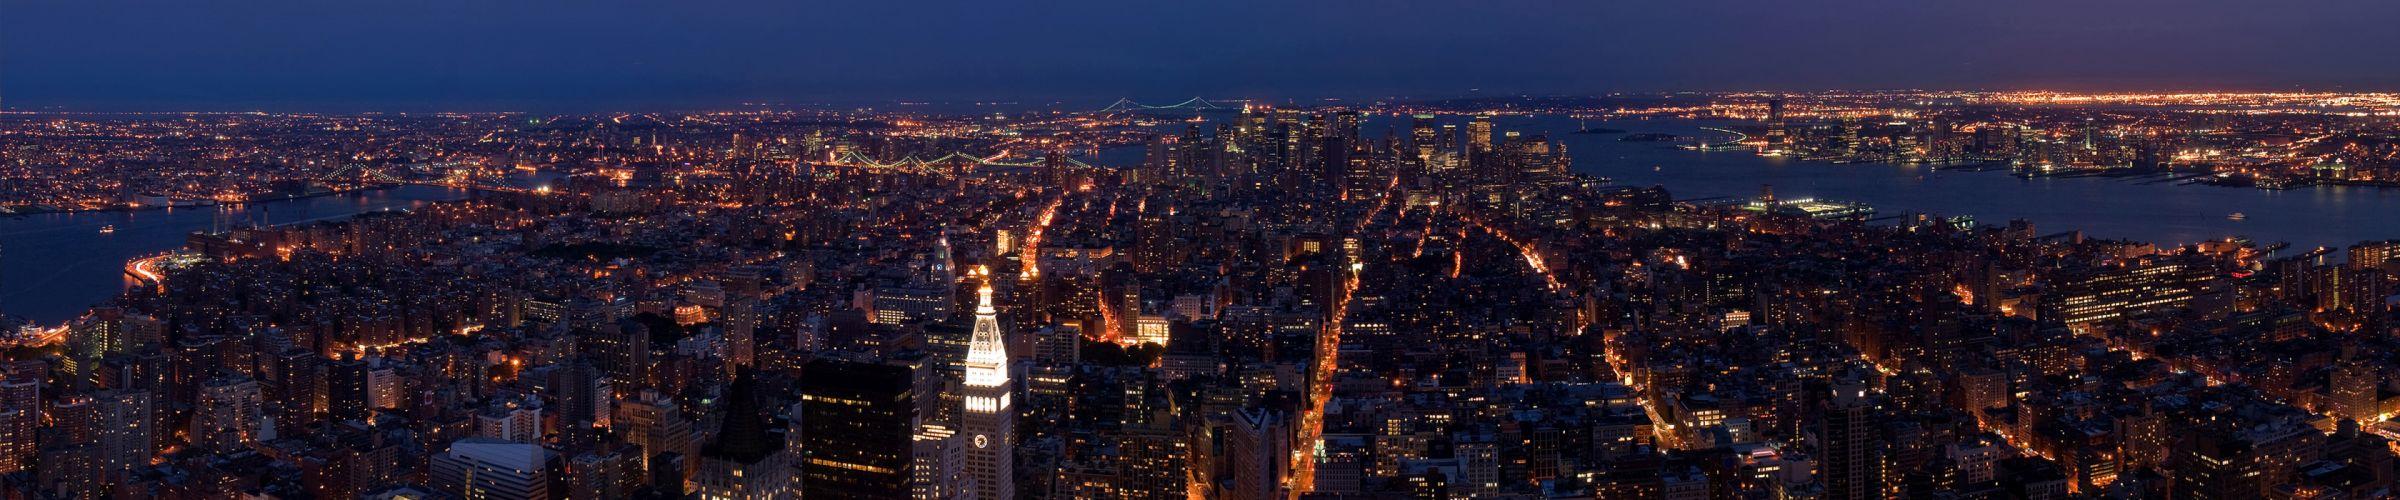 New York Manhattan k wallpaper